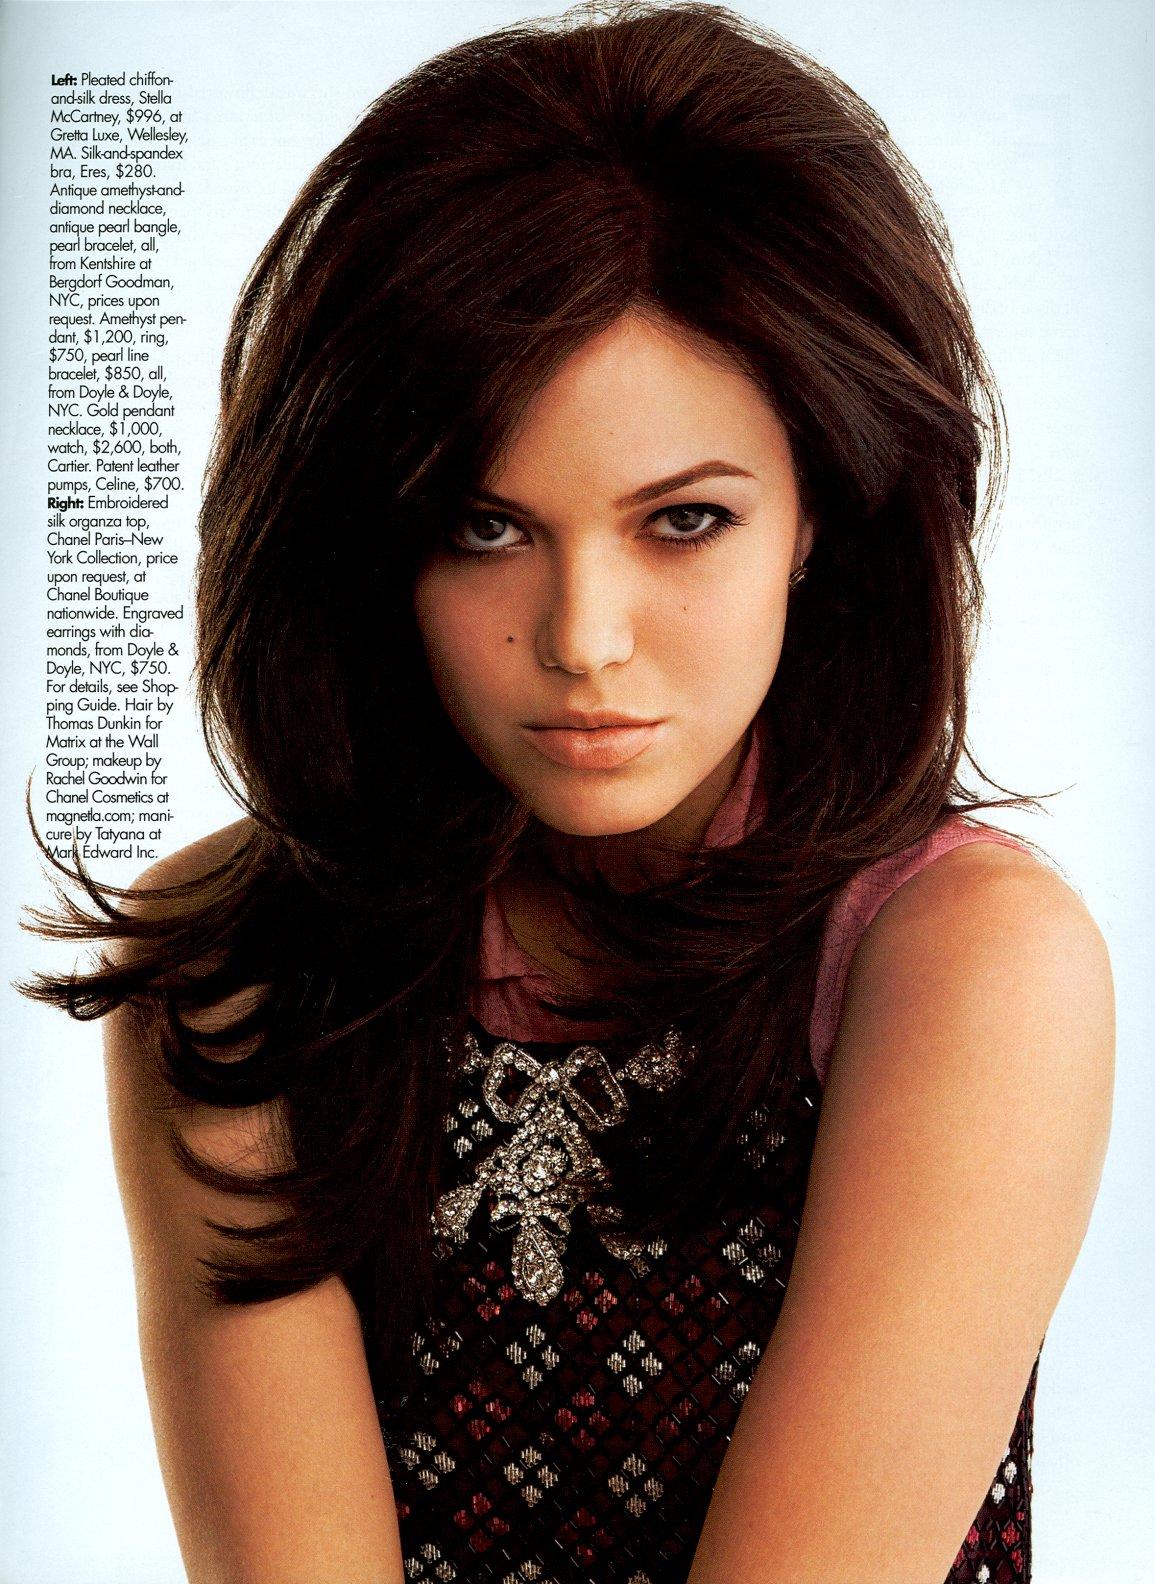 http://3.bp.blogspot.com/_GCAuqodmOE4/TRJnLuDlaeI/AAAAAAAAF6U/nmvPMelKgz8/s1600/Sexiest+Mandy+Moore++%25287%2529.jpg